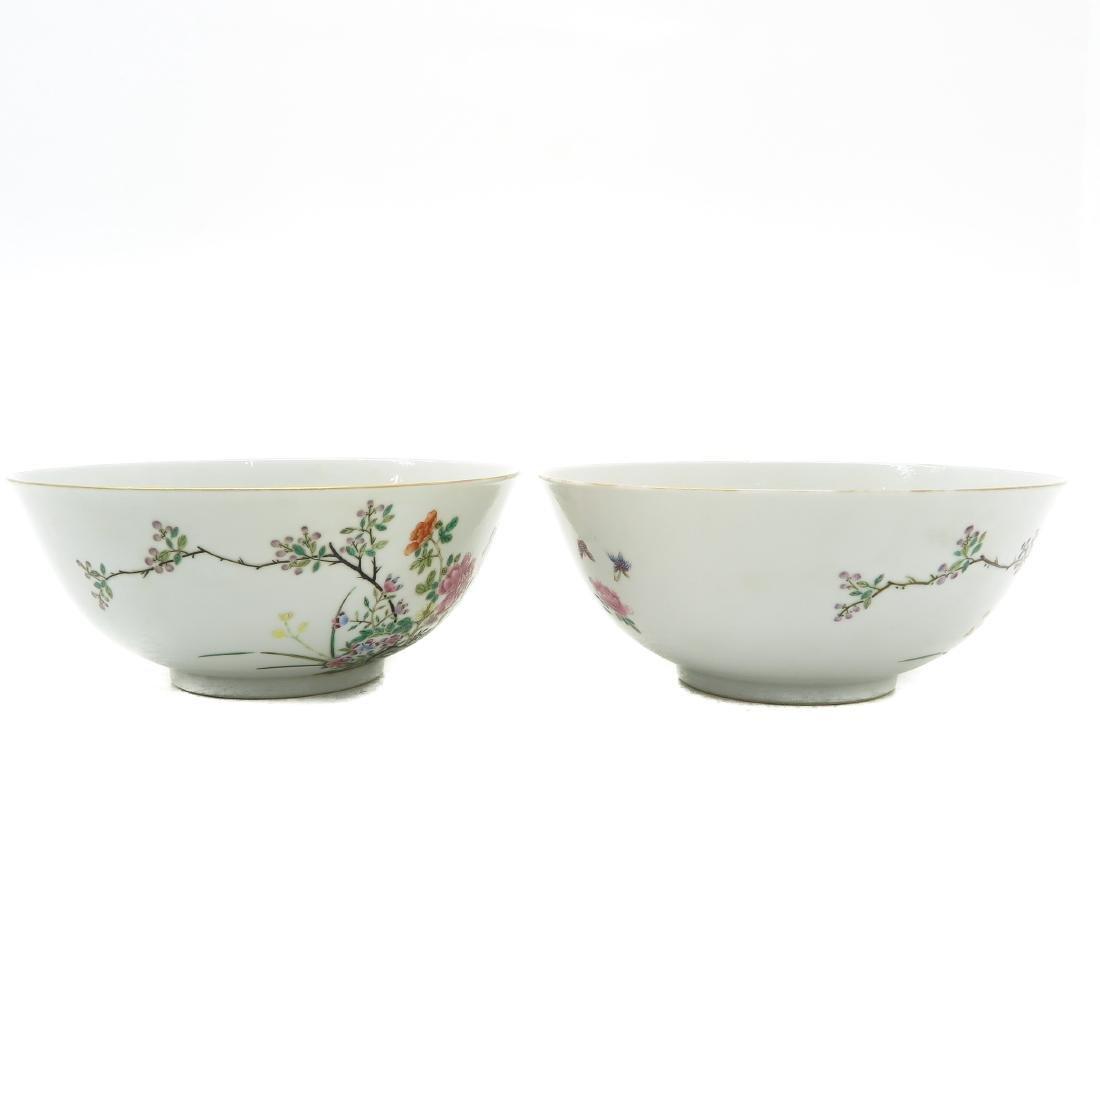 Lot of 2 Bowls - 3